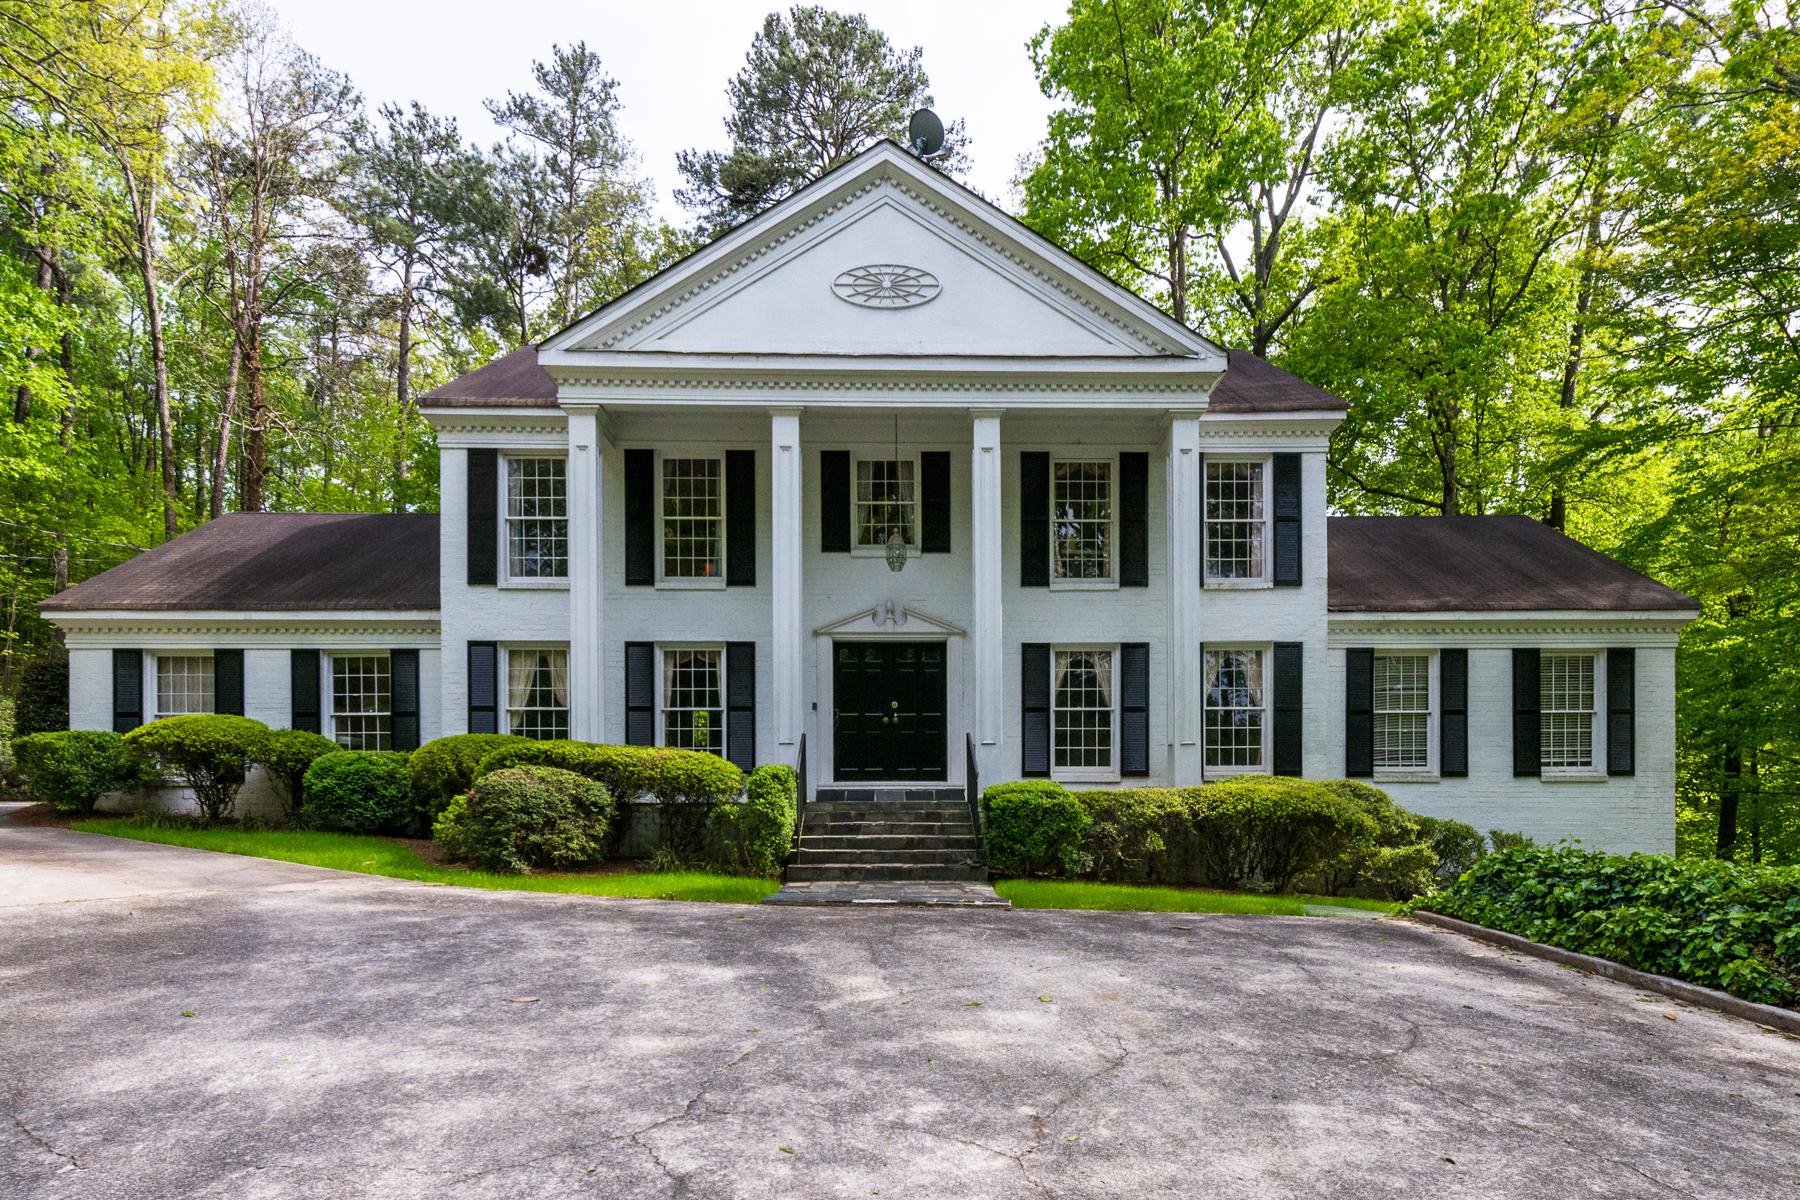 Đất đai vì Bán tại 5.3 Acre Property With Picturesque Pond In Buckhead 4326 Harris Valley Road NW Atlanta, Georgia 30327 Hoa Kỳ